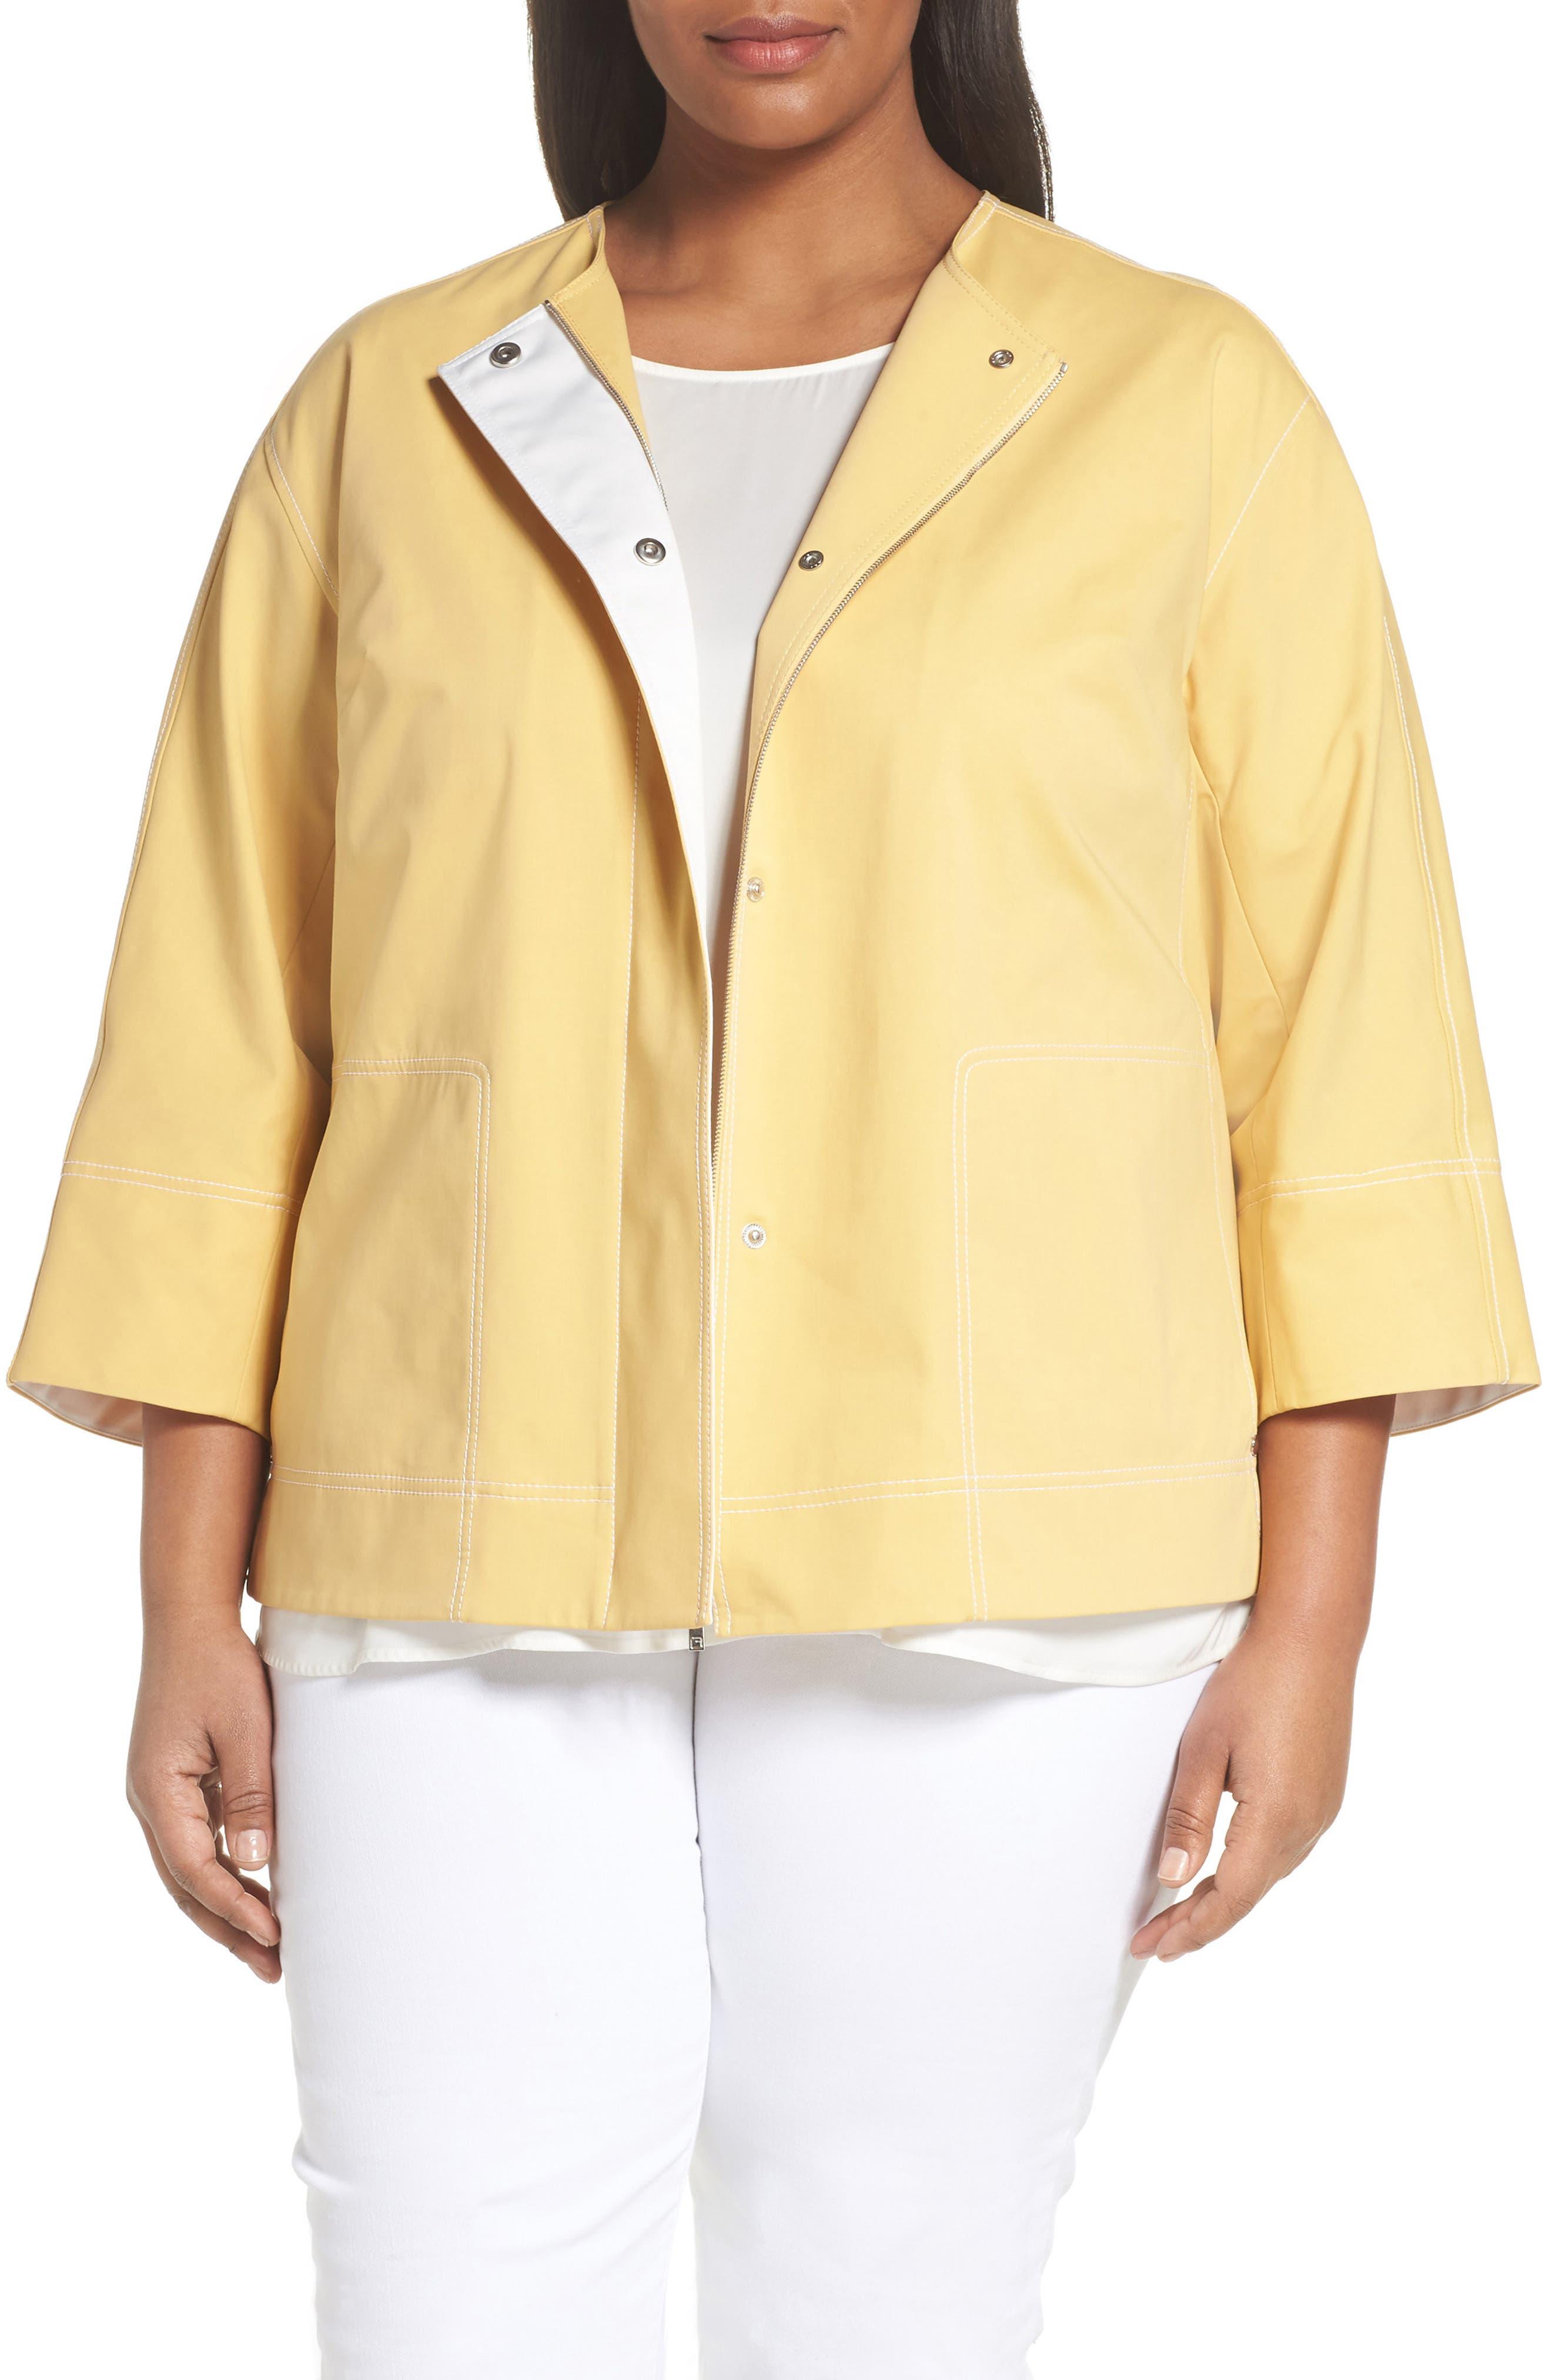 Milo Zip Jacket,                         Main,                         color, SIENNA YELLOW